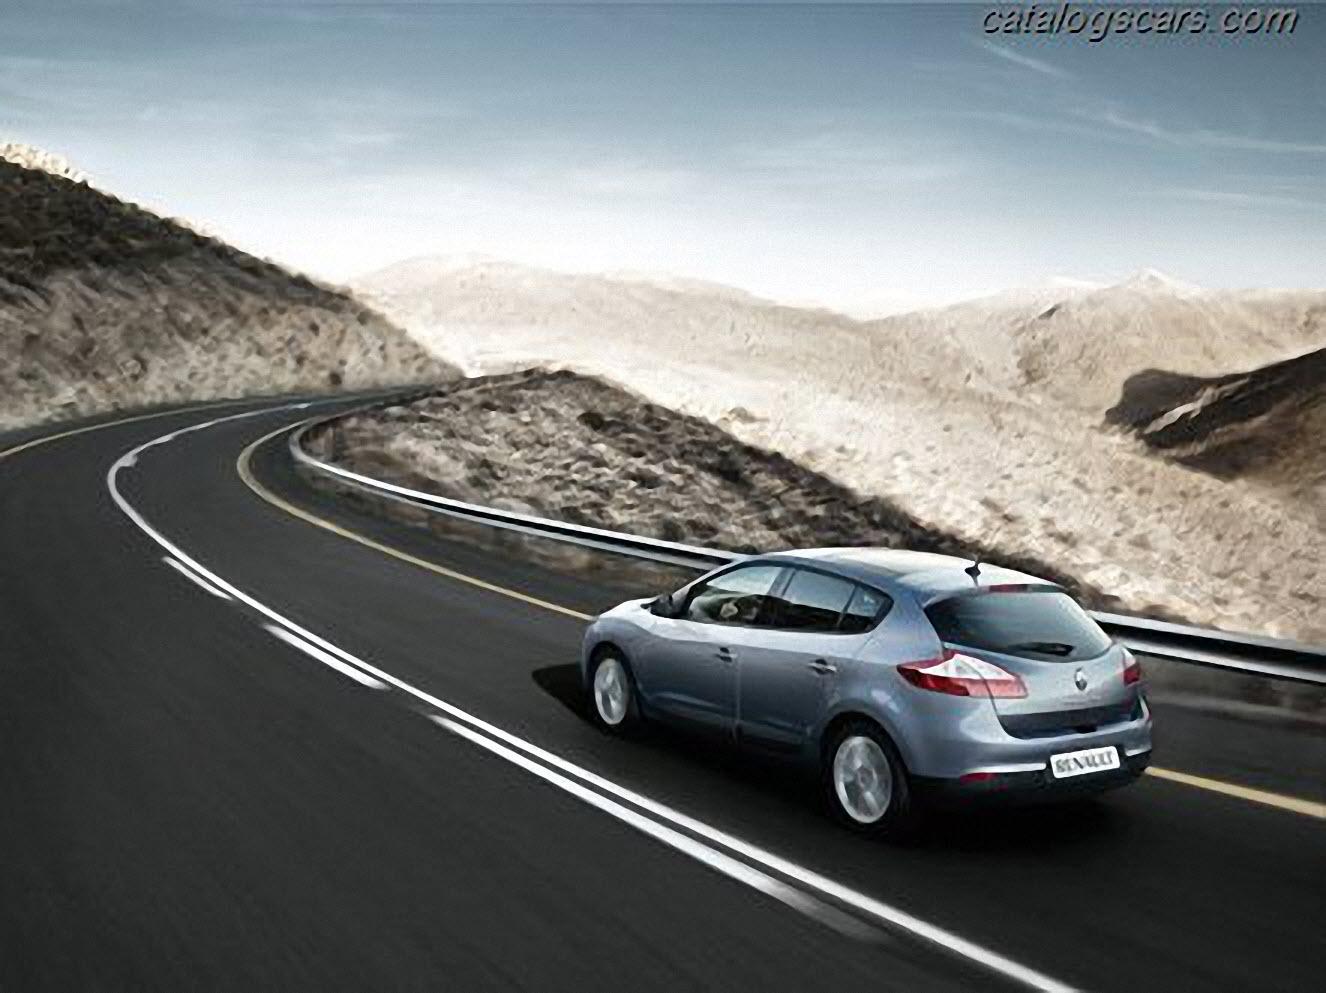 صور سيارة رينو ميجان هاتش باك 2015 - اجمل خلفيات صور عربية رينو ميجان هاتش باك 2015 - Renault Megane Hatchback Photos Renault-Megane_Hatchback_2012_800x600_wallpaper_11.jpg